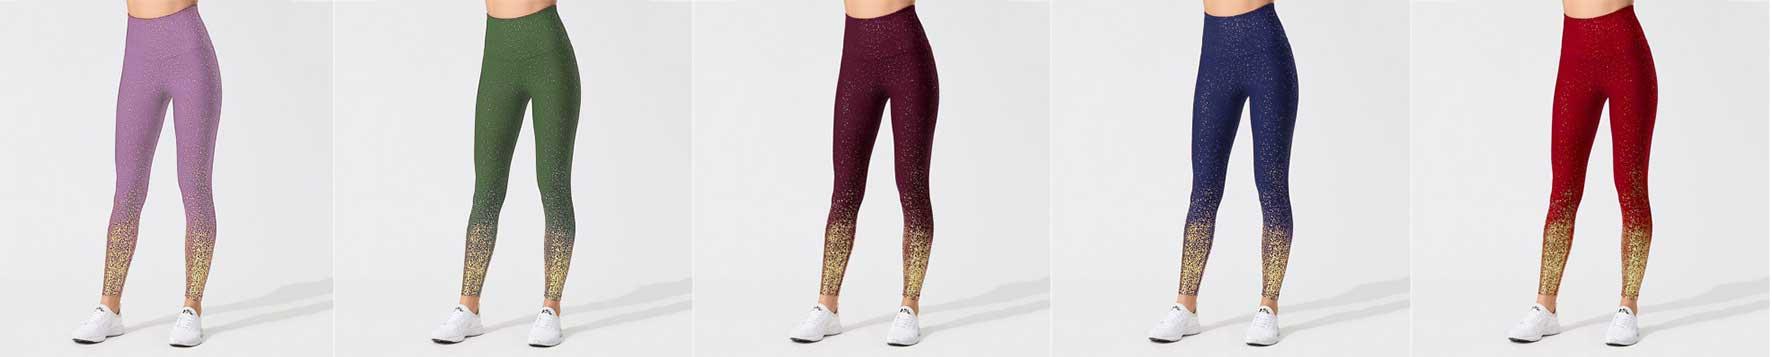 Glitter- printing-leggings-with-multicolor-design